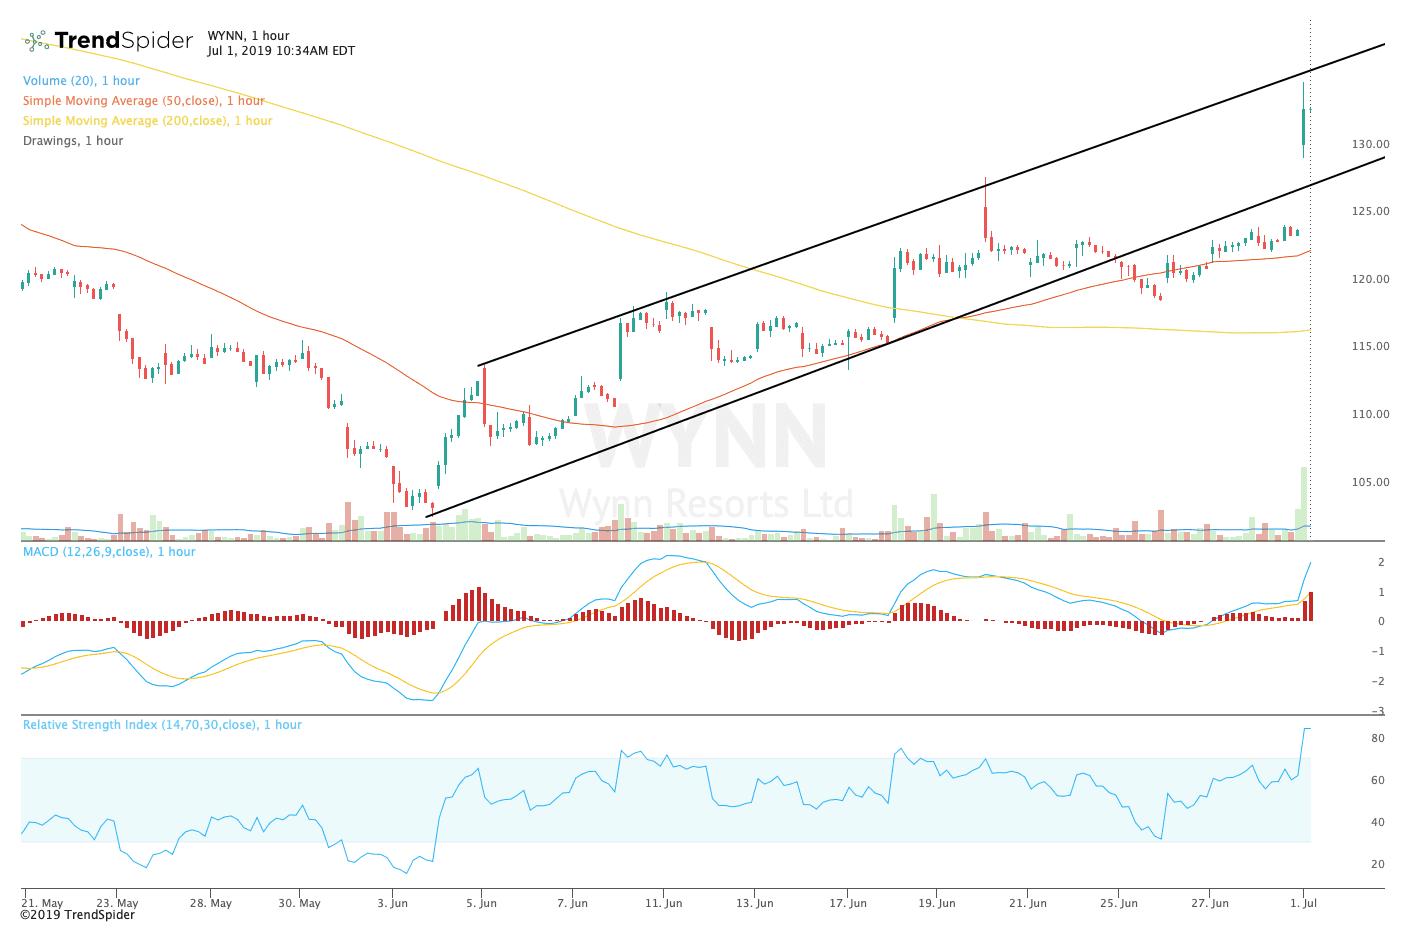 Wynn Stock Breaks Out as Macau Gaming Revenue Soars